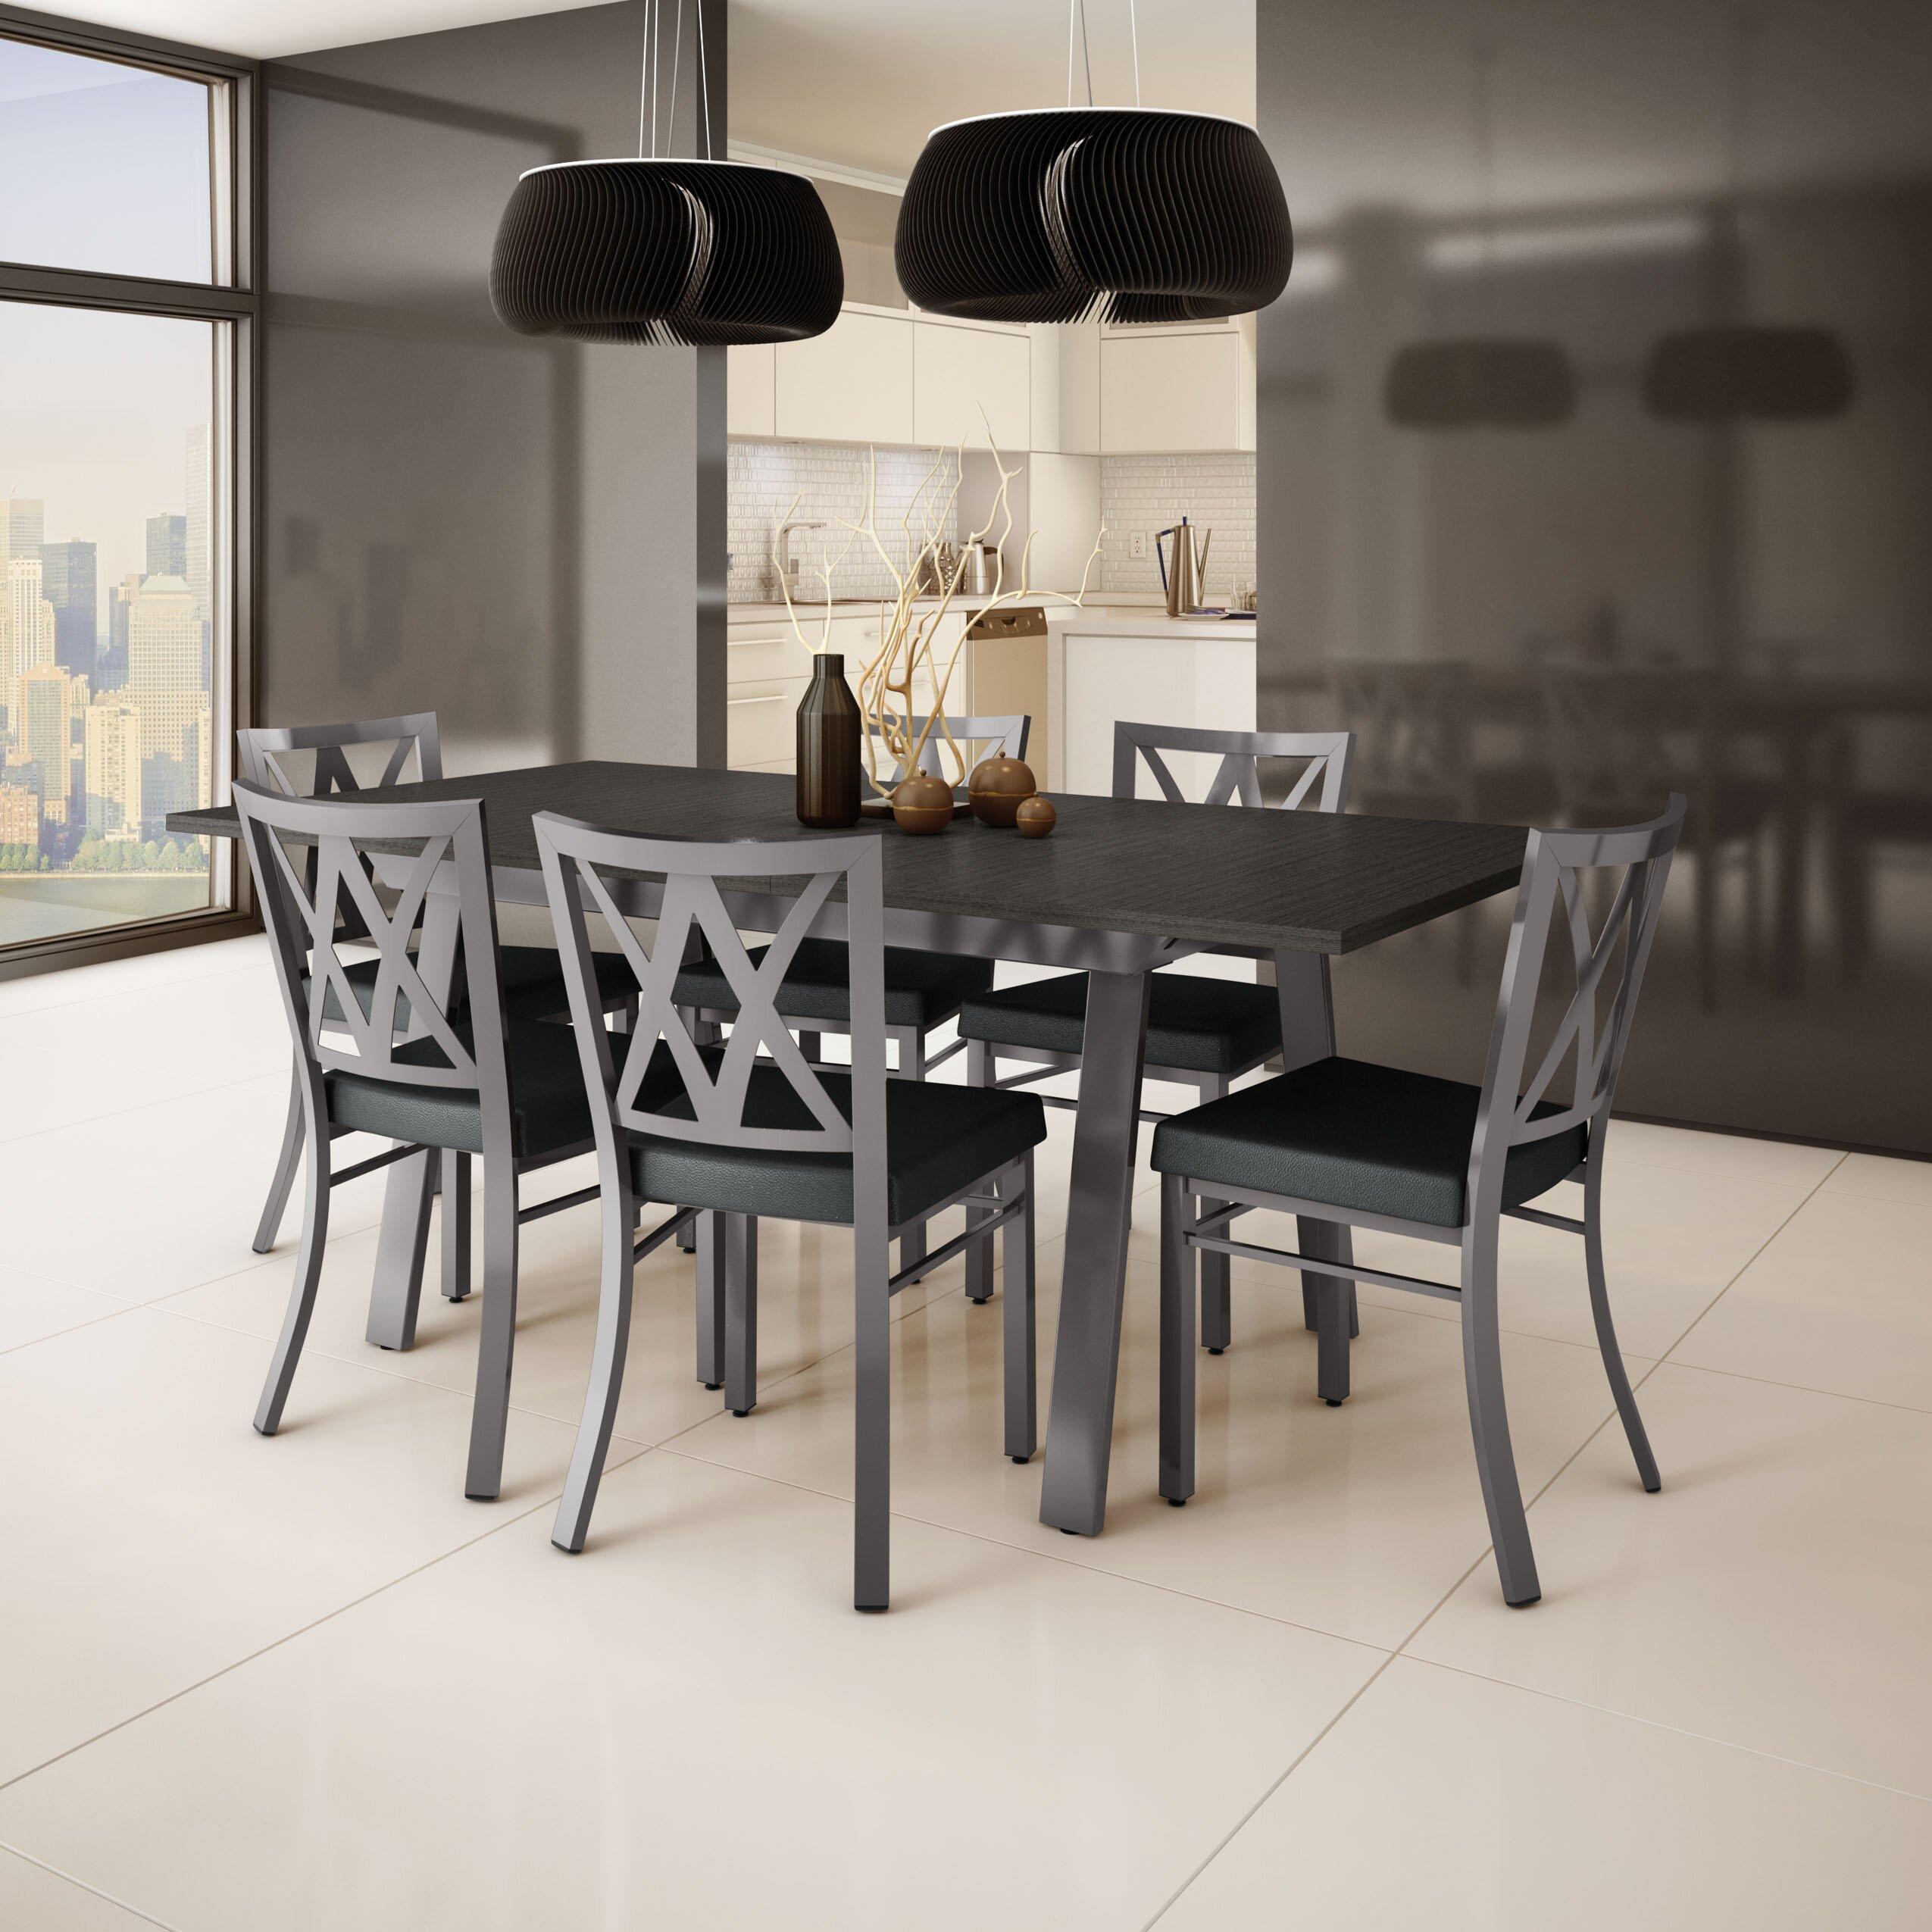 Dining Furniture Set: Amisco Drift 9 Piece Dining Set